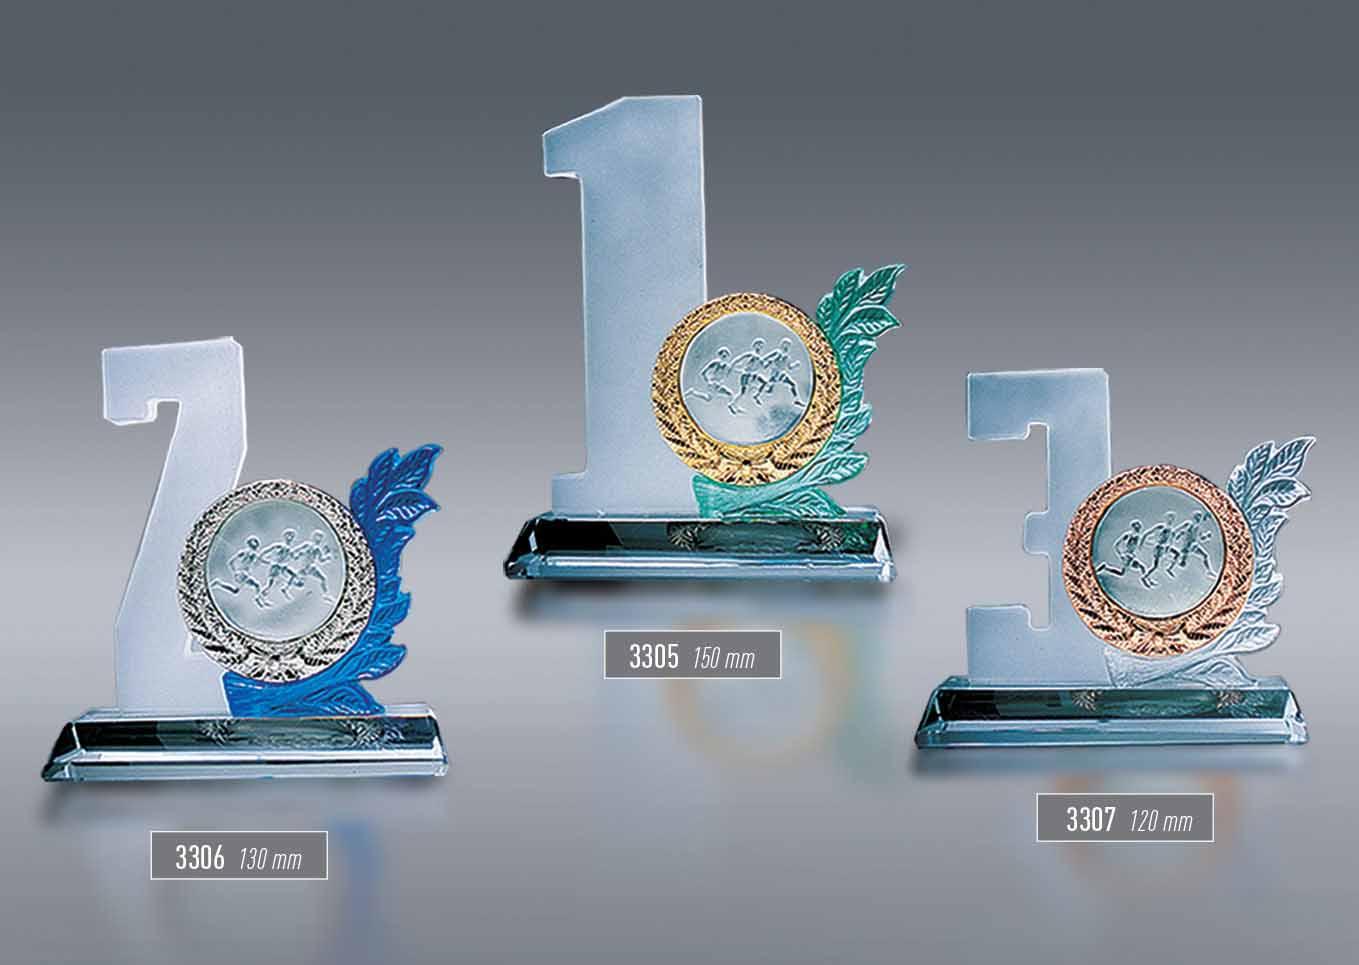 3305 - 3306 -3307  - Sport Award